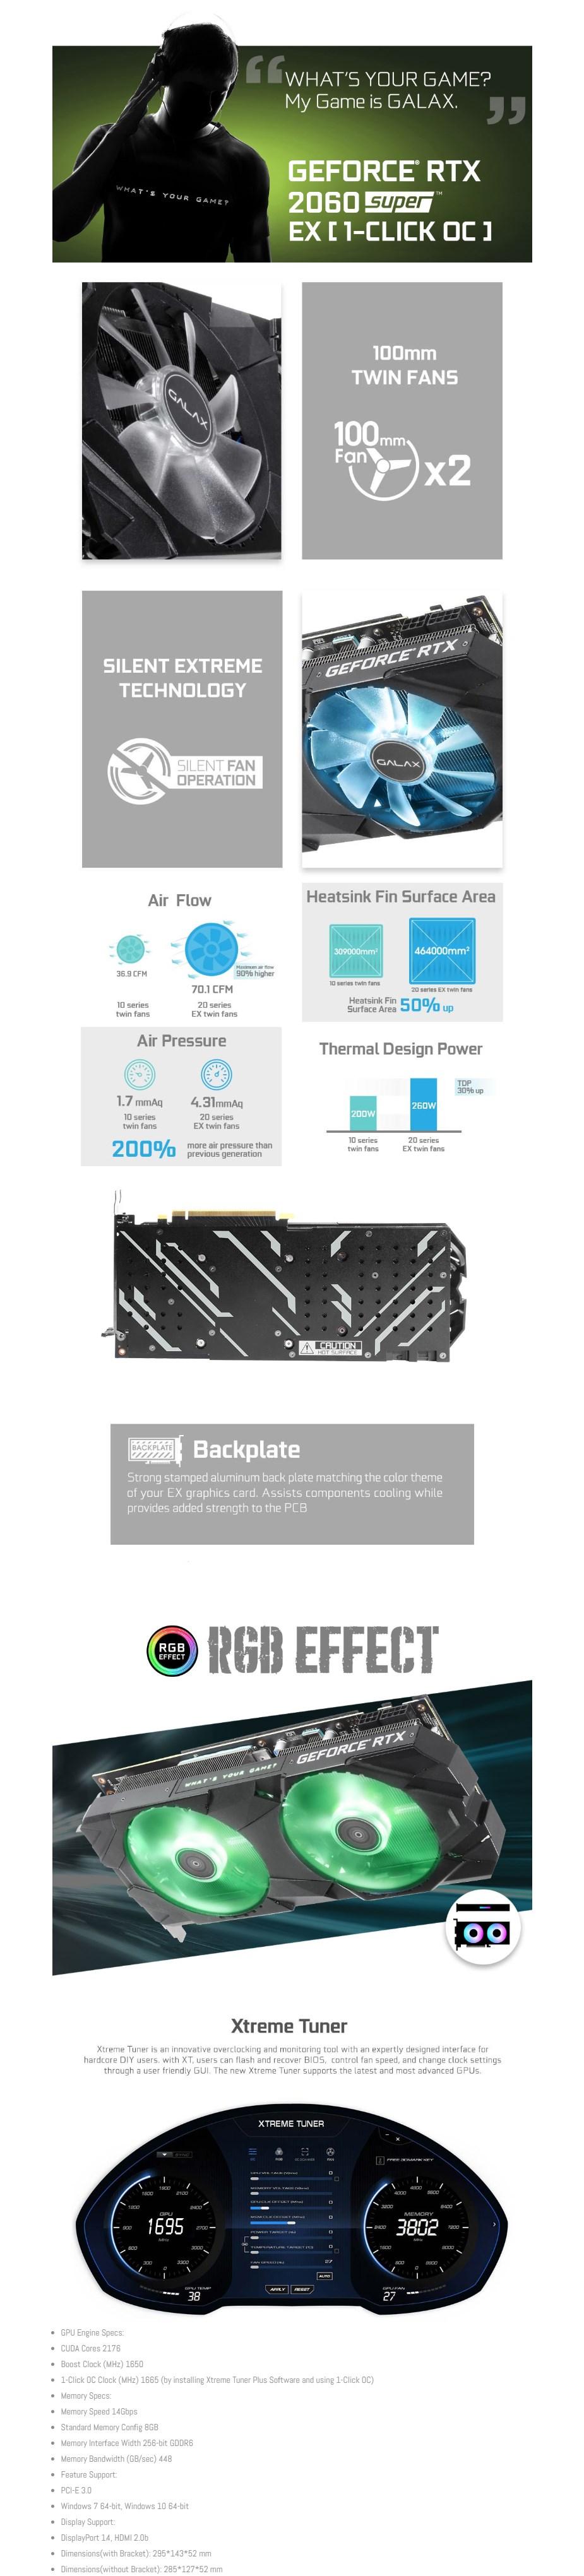 GALAX GeForce RTX 2060 SUPER EX 1-Click OC V2 8GB Video Card - Overview 1